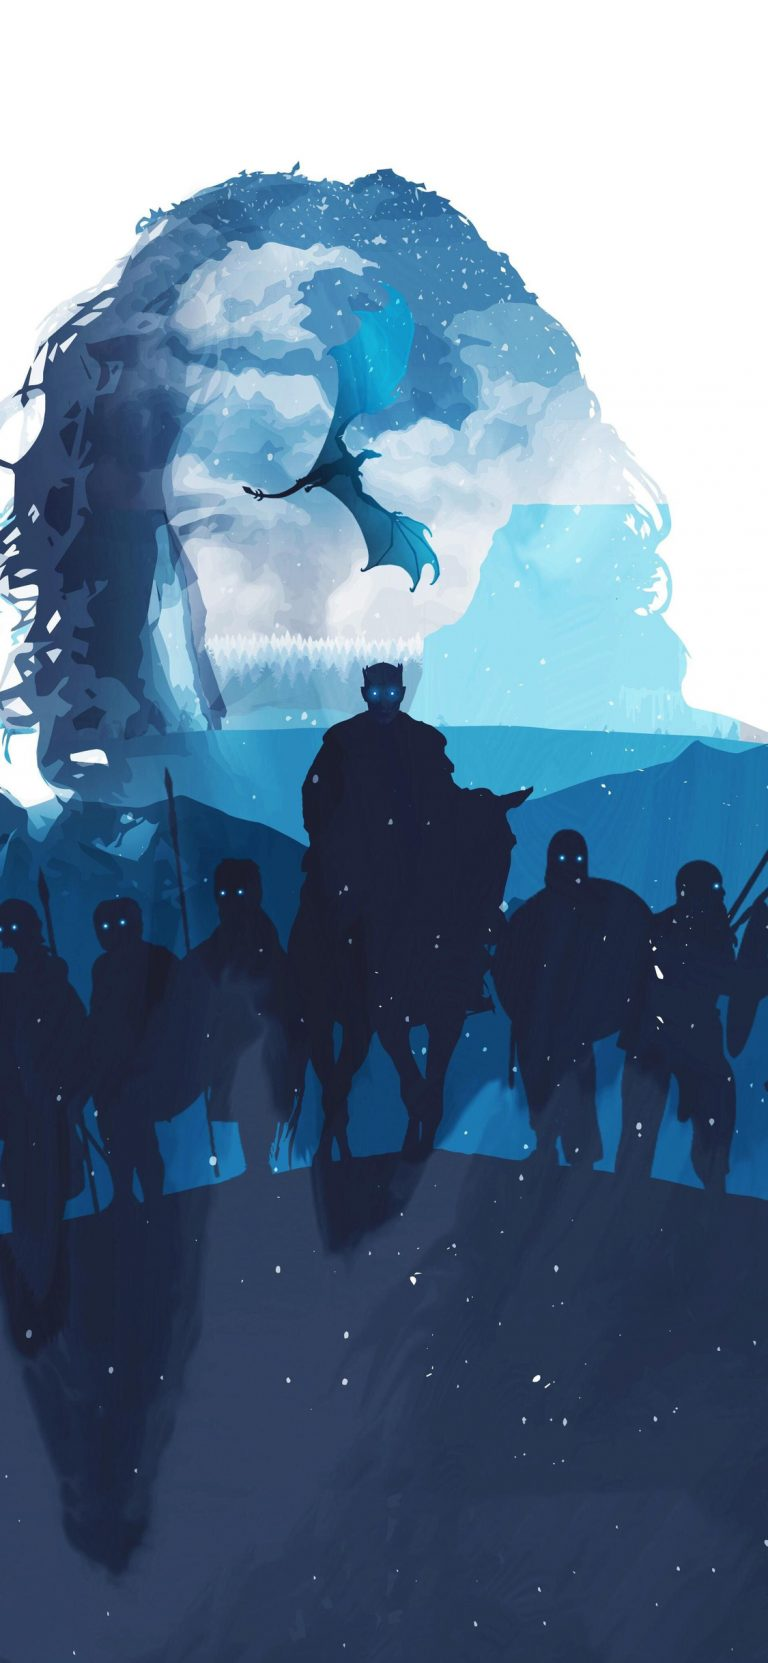 Best Game Of Thrones Wallpapers For Iphone Geek Tech Online